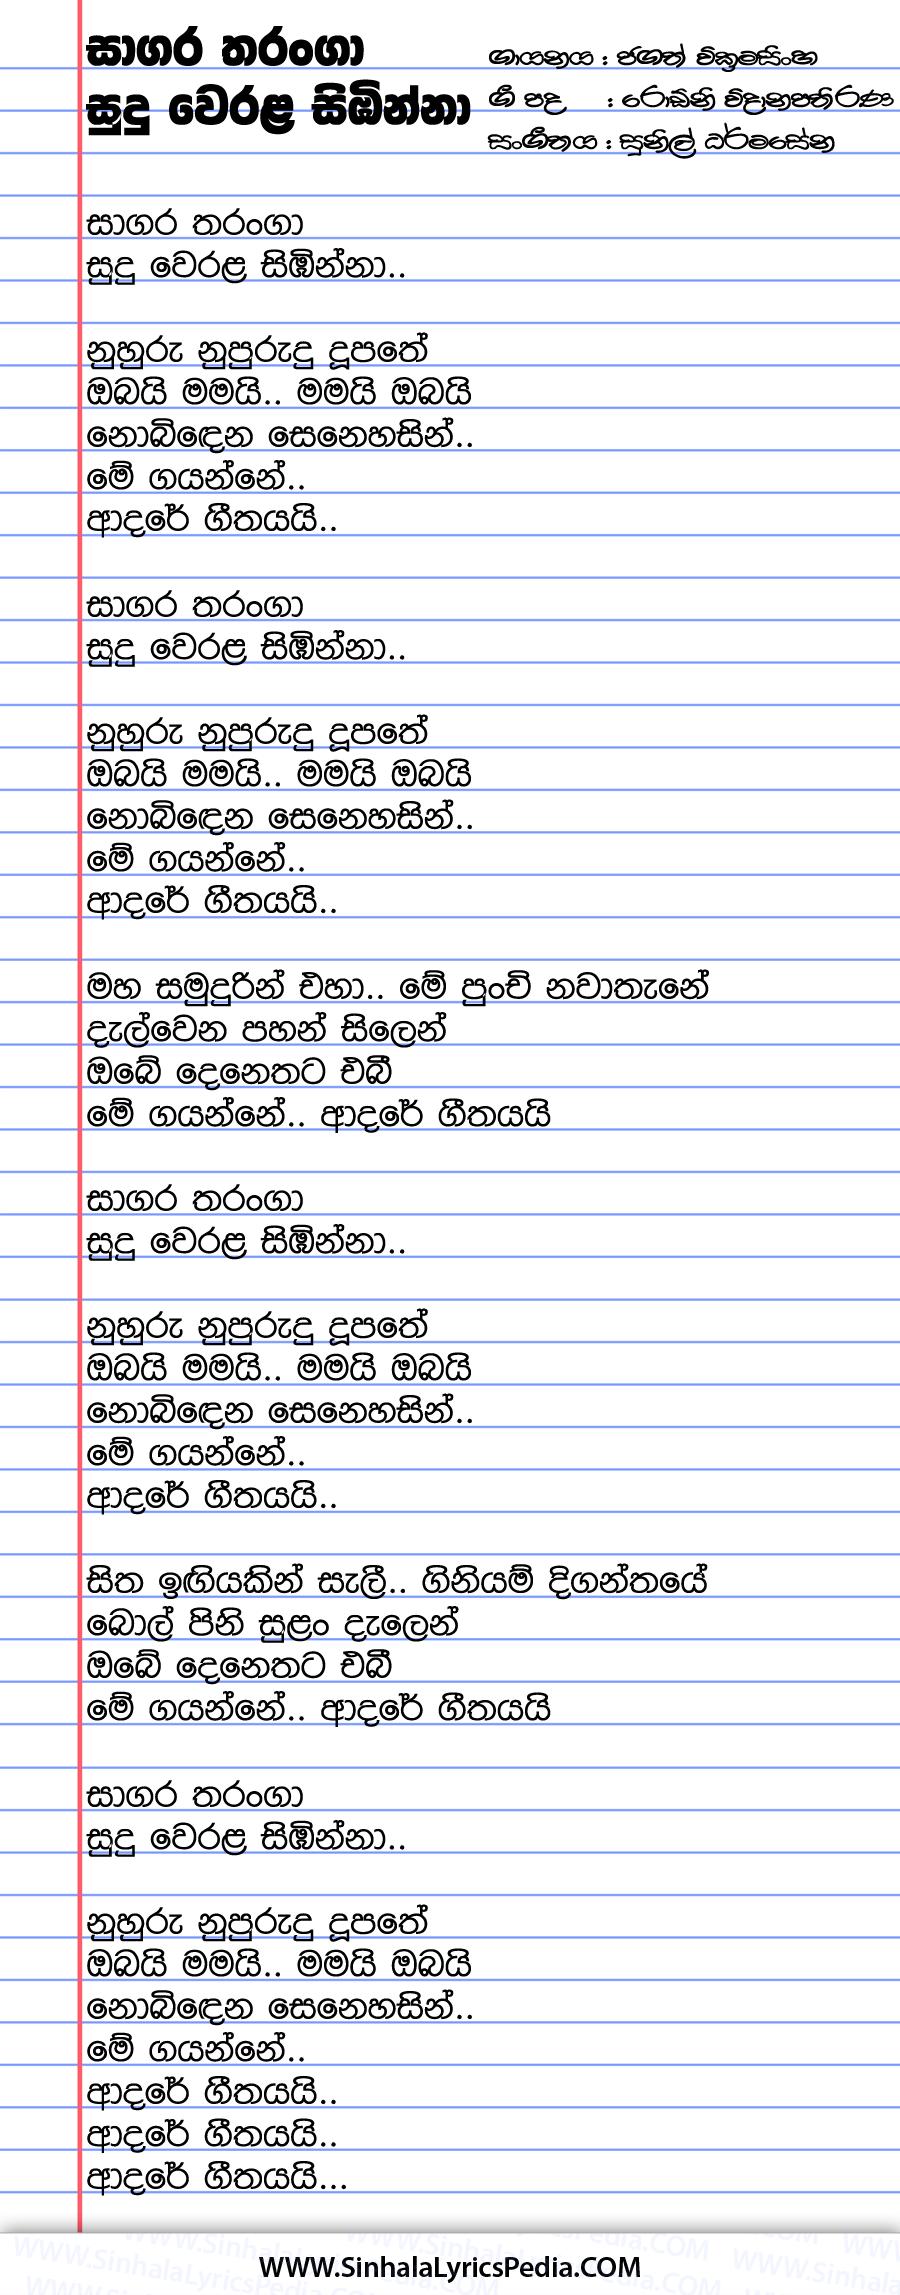 Sagara Tharanga Sudu Werala Sibinna Song Lyrics